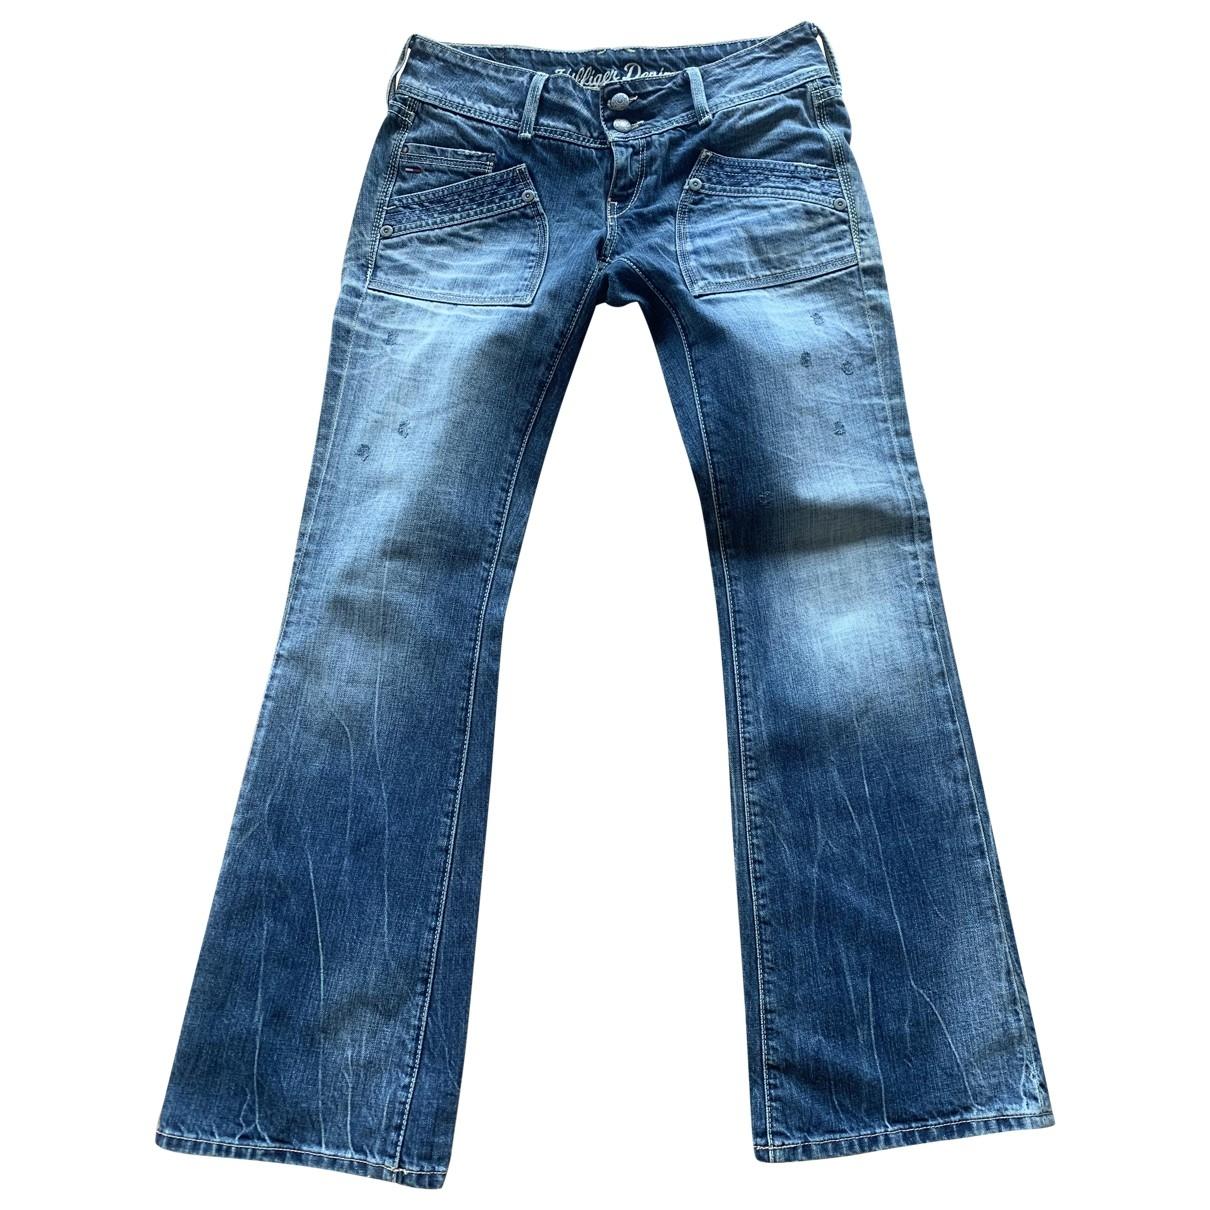 Tommy Hilfiger \N Blue Cotton Jeans for Women 36 FR